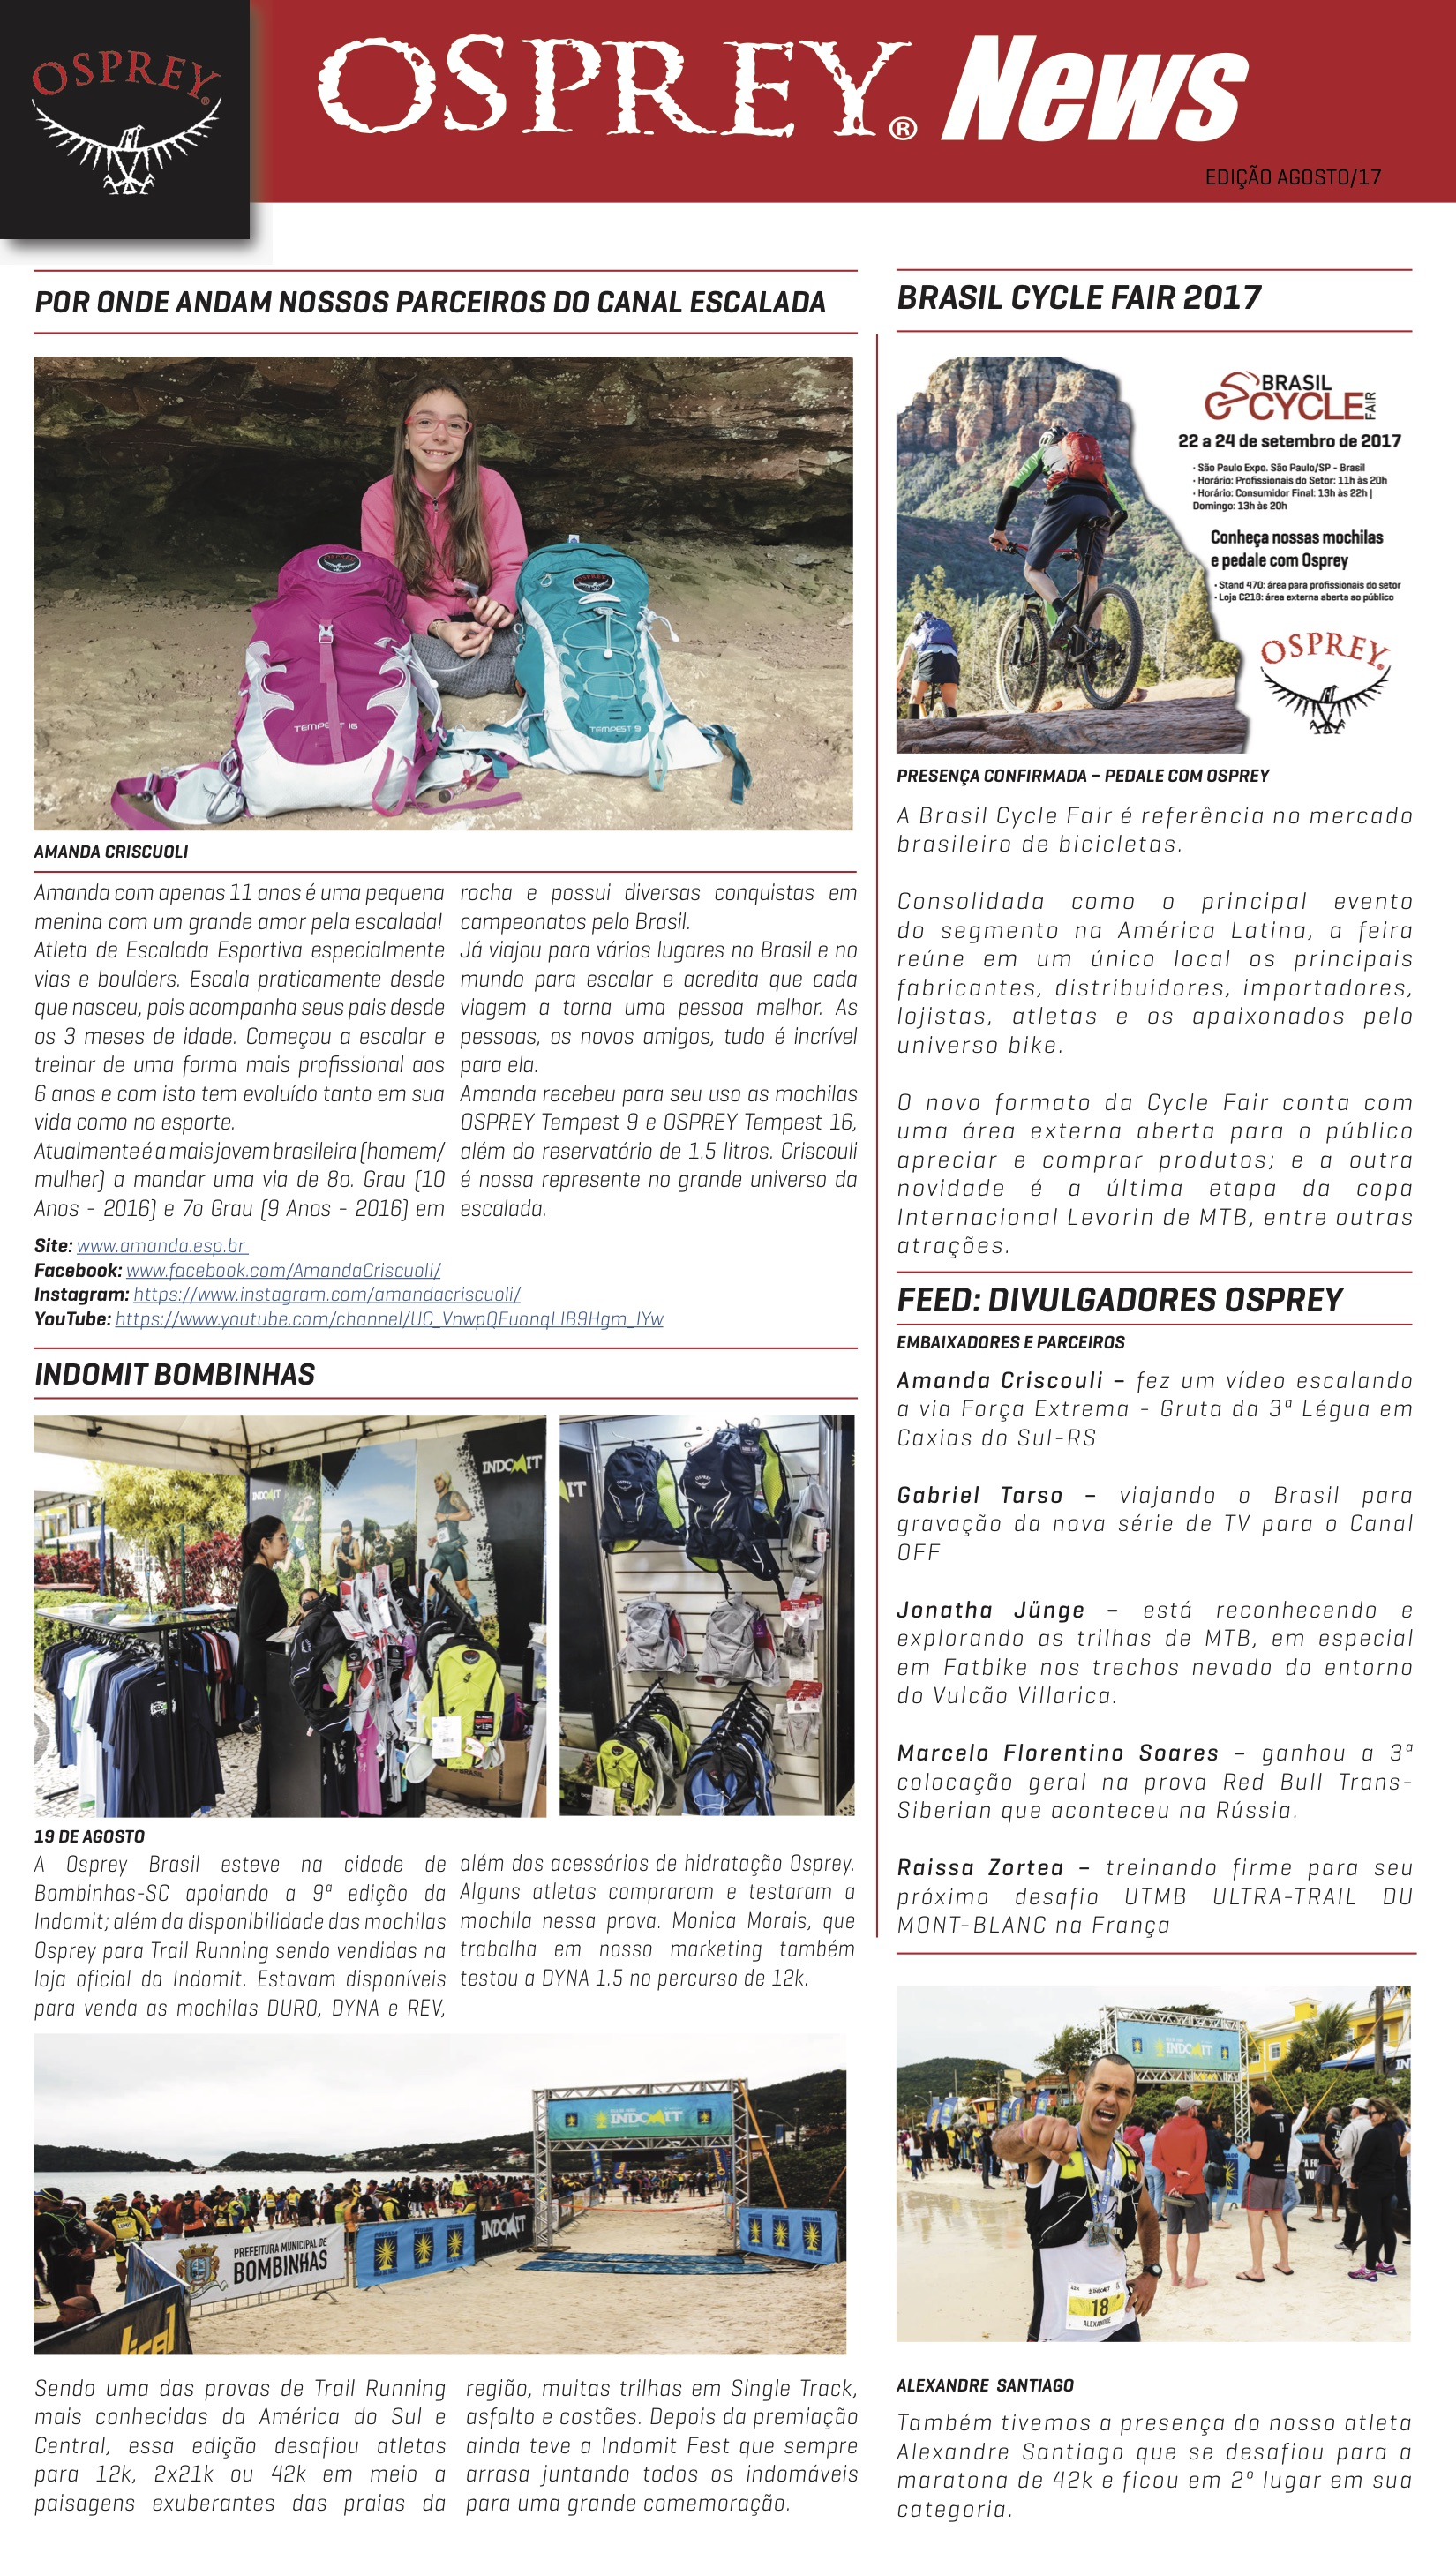 Press Release - Osprey News